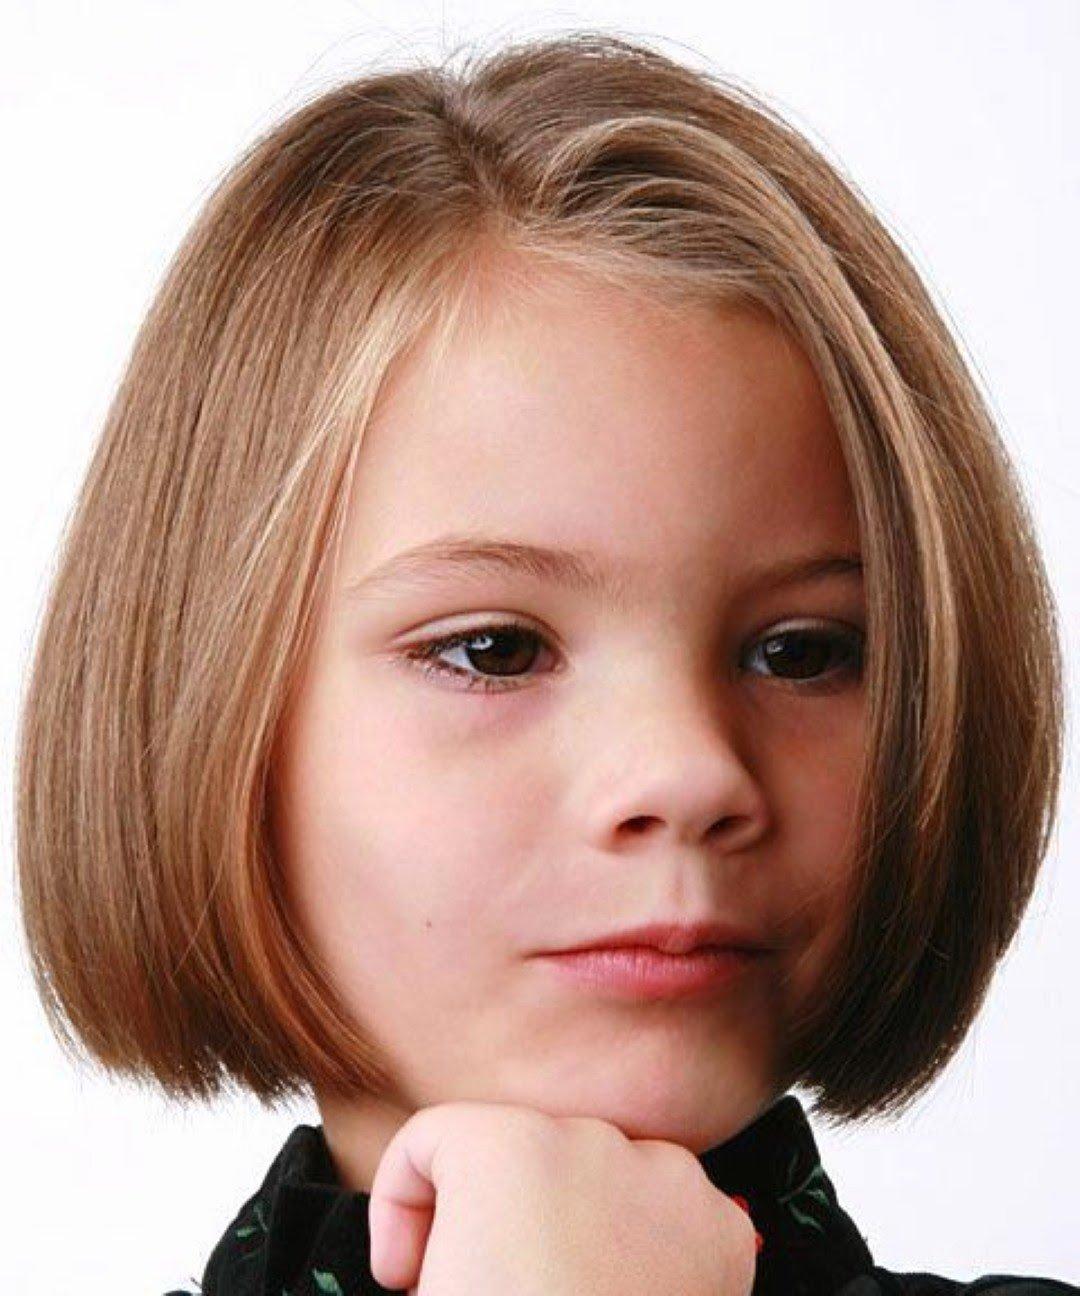 Potongan Rambut Untuk Seorang Gadis Berusia 4 6 Tahun 30 Gambar